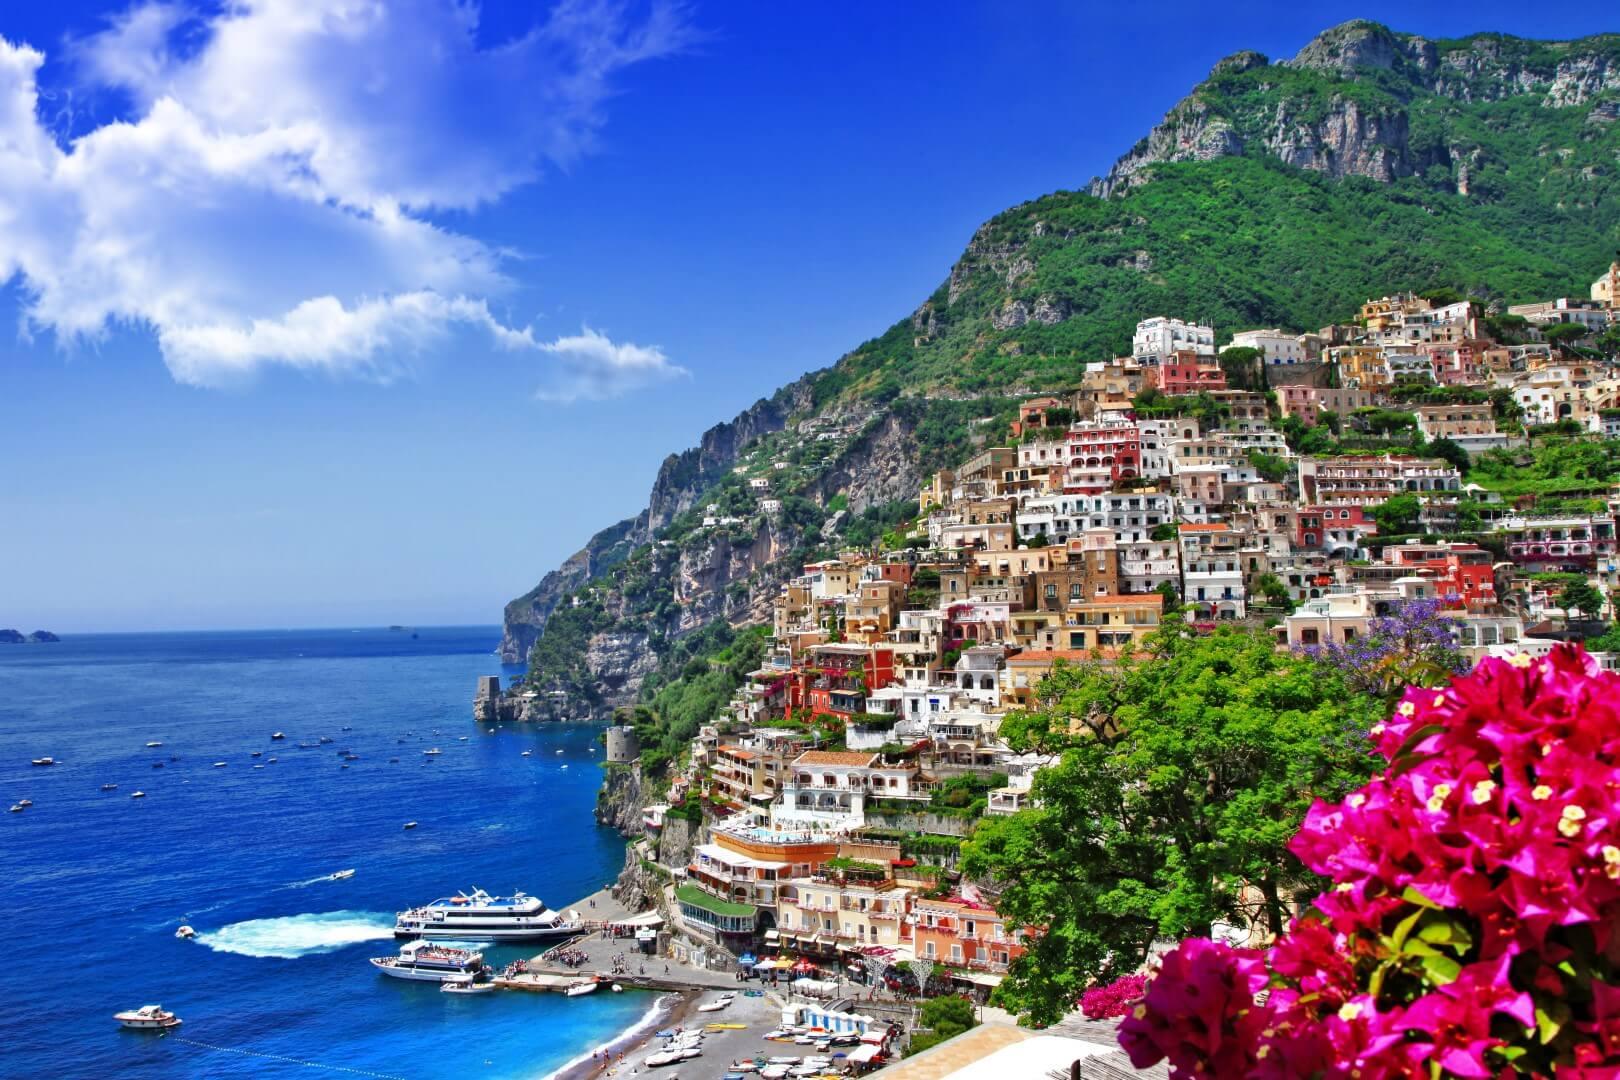 Italia en mayo viajar a italia for Immagini desktop 4k